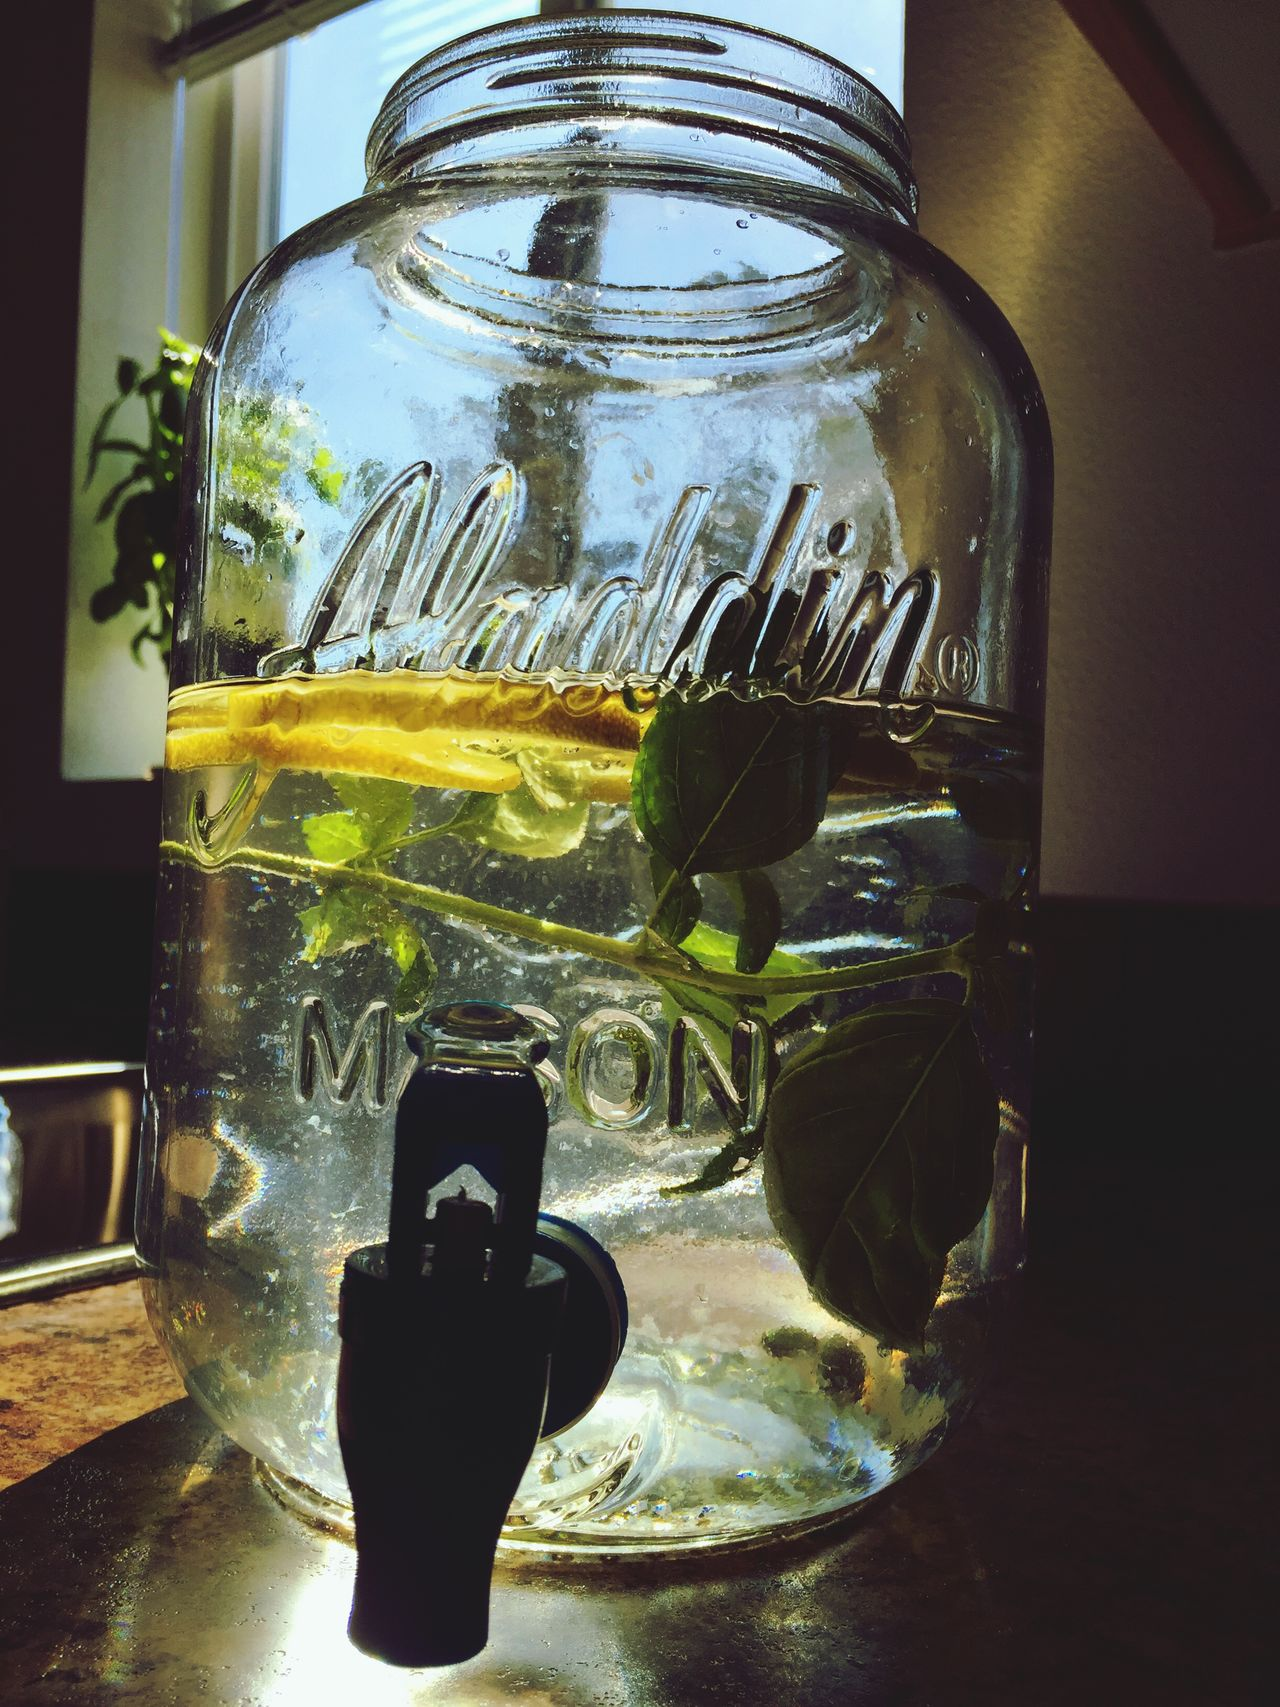 """Makin' Sun Tea"" Filtered fresh water...check...lemon slices...check...fresh basil...check...just add tea bags and set in sun all day. Suntea Tea Icetea Still Life StillLifePhotography Enjoying Life Summer Newmexicophotography NewMexicoTRUE Summertime NewMexcio"